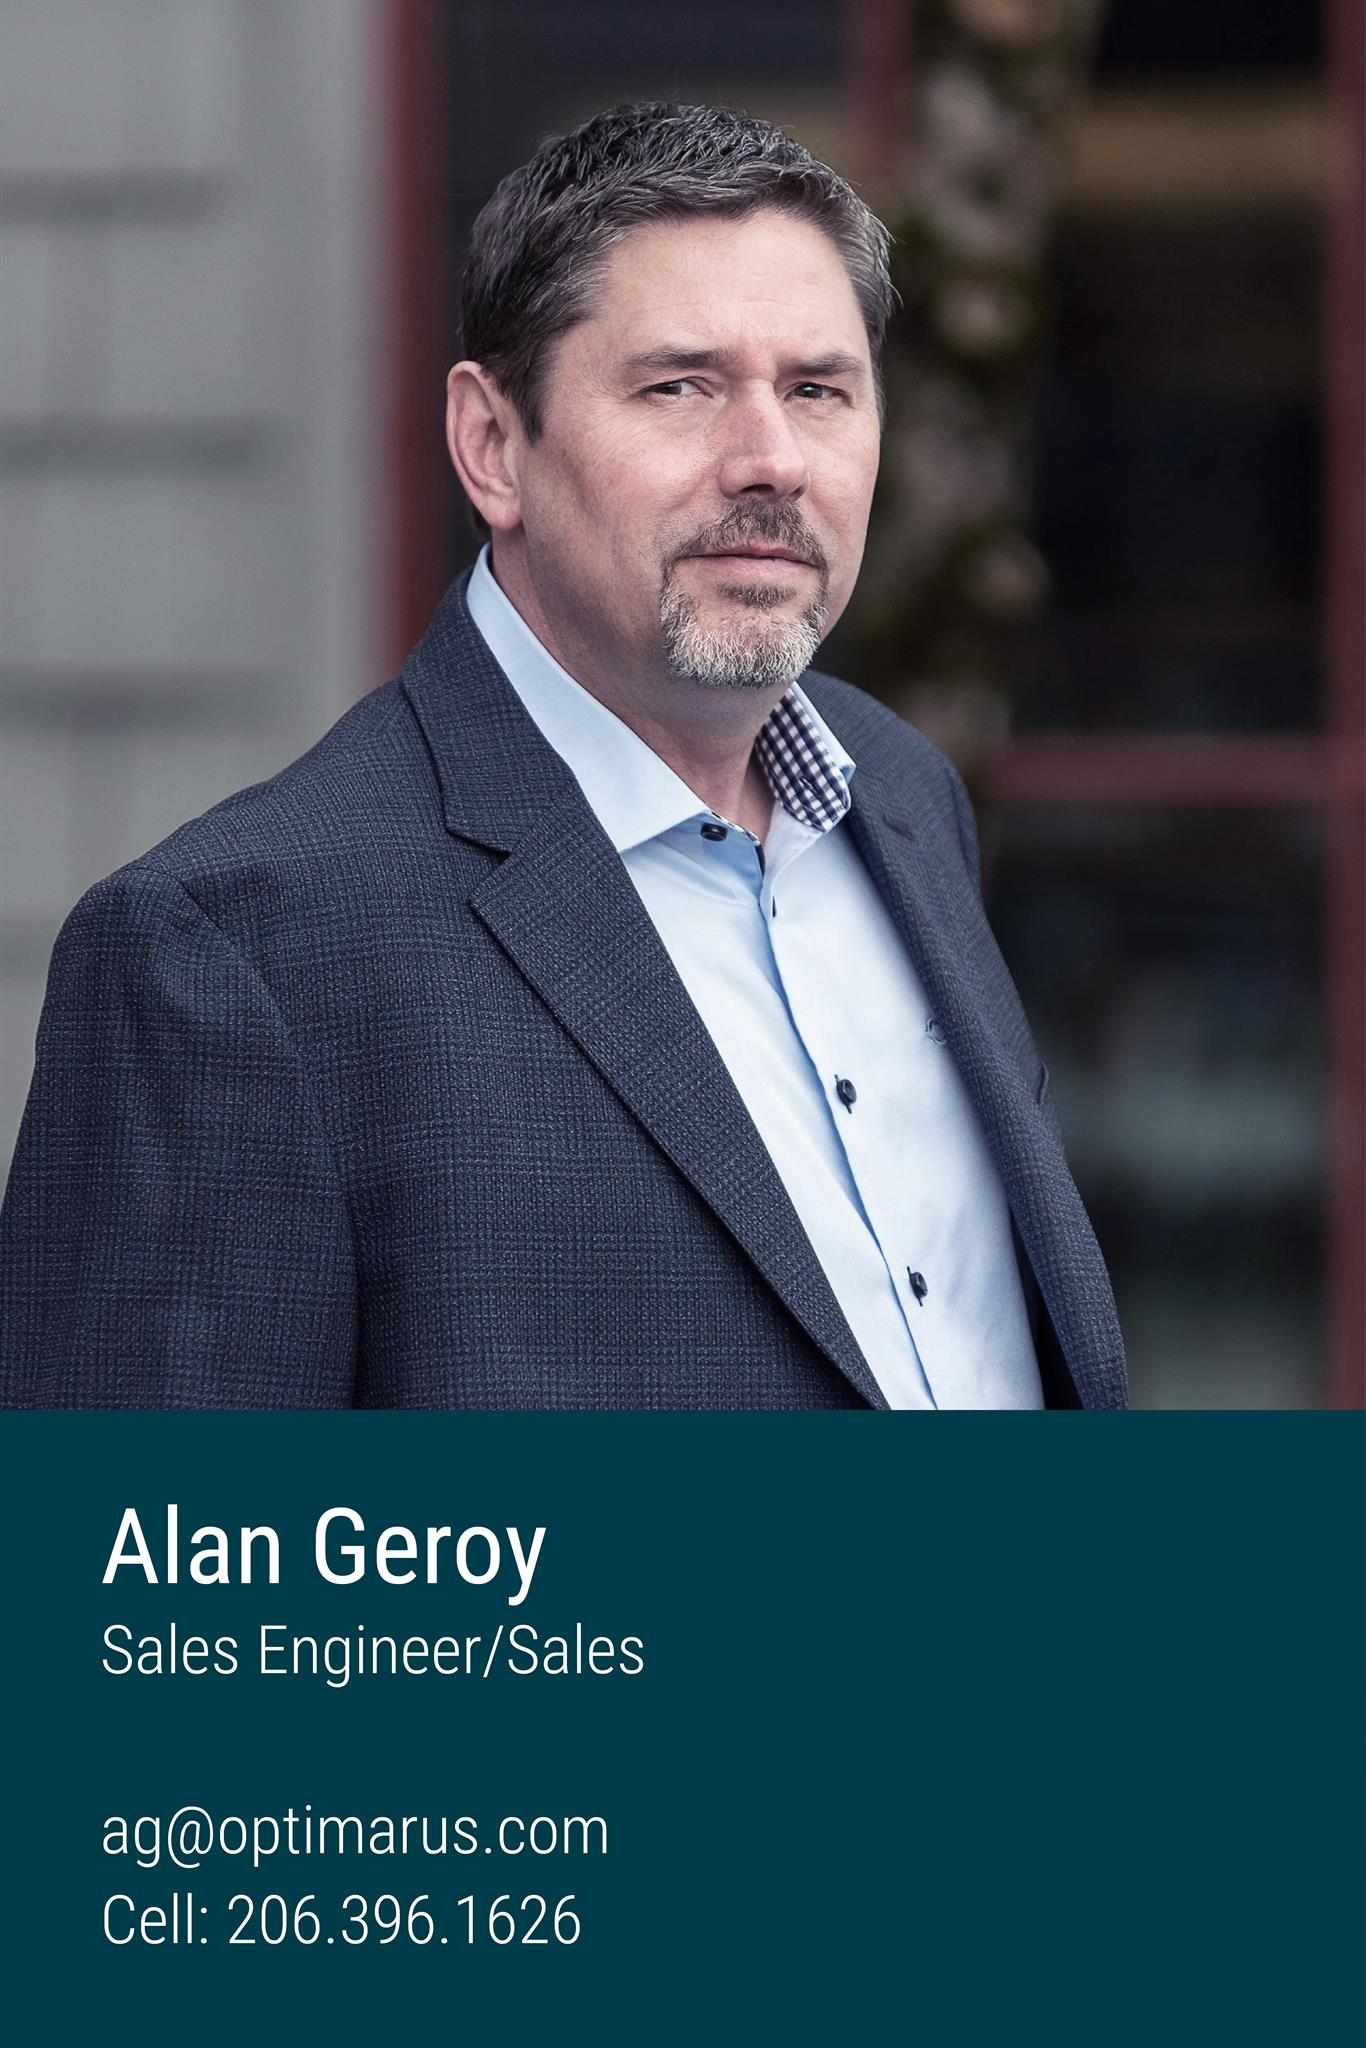 Alan Geroy